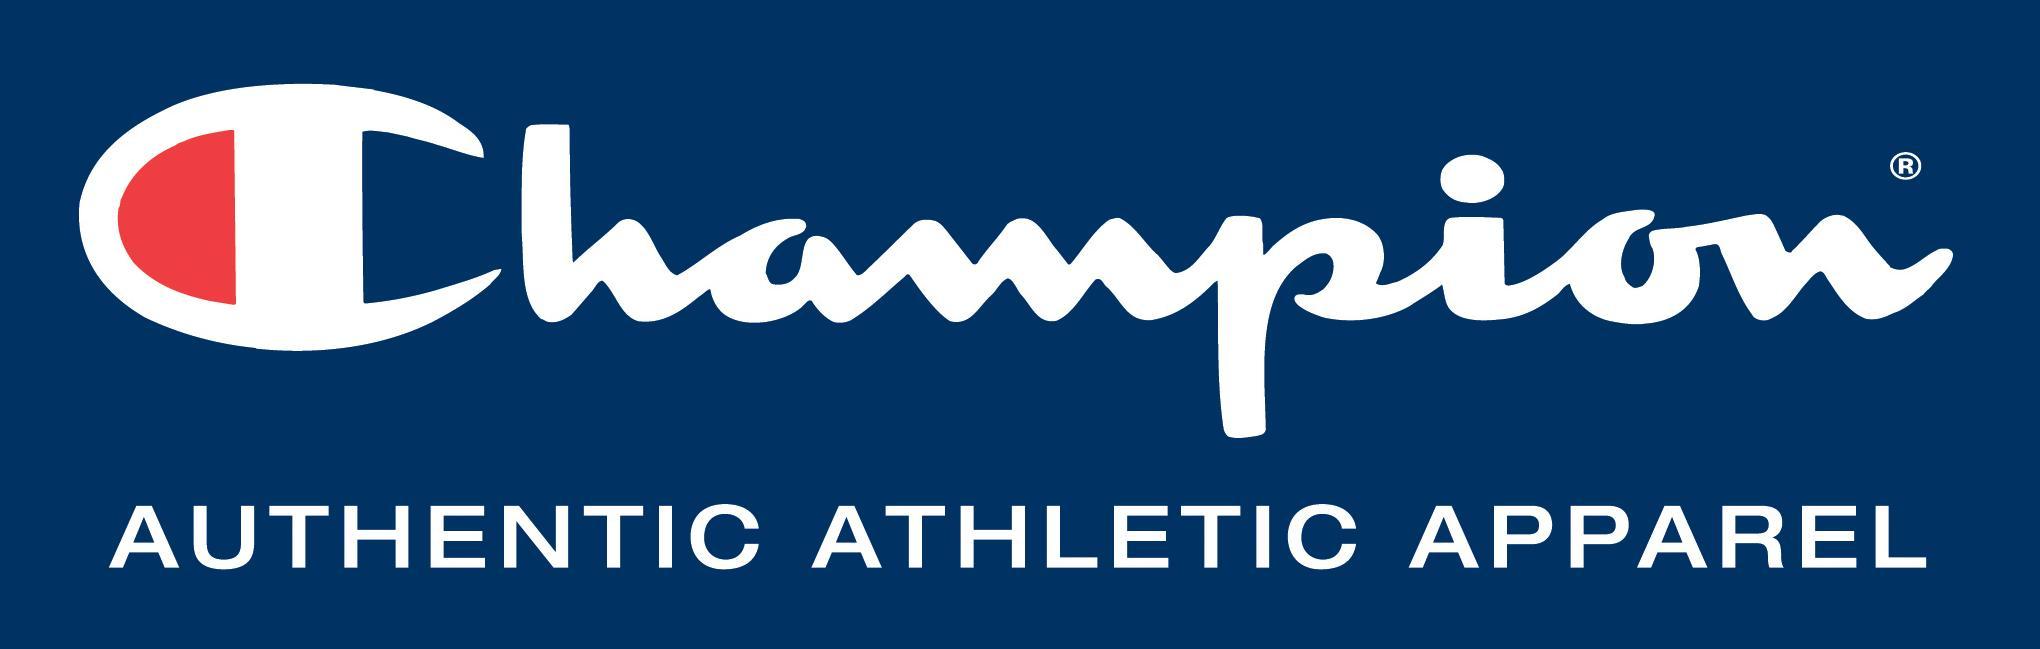 www.champion.com/